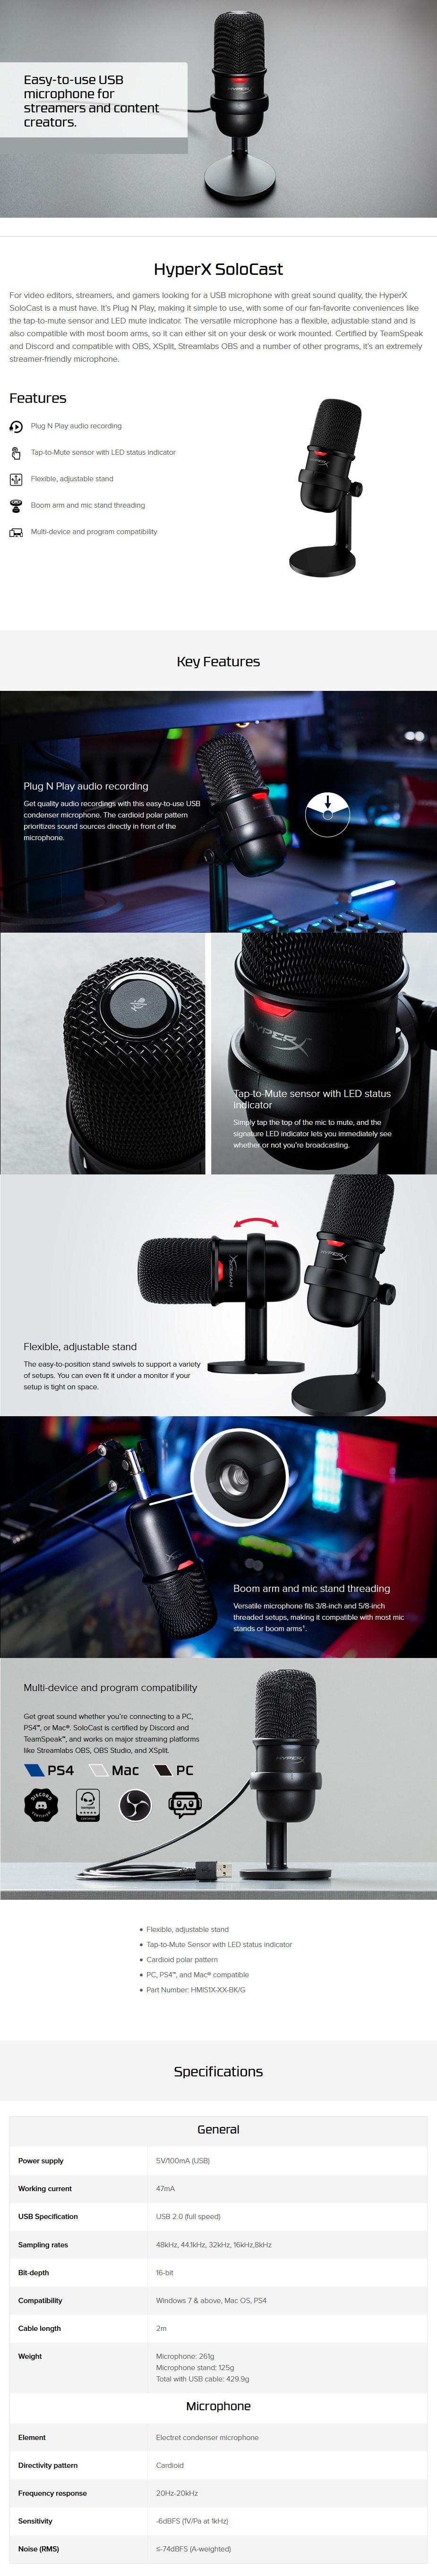 hyperx-solocast-hmis1xxxbkg-usb-condenser-gaming-microphone-ac42671-9.jpg